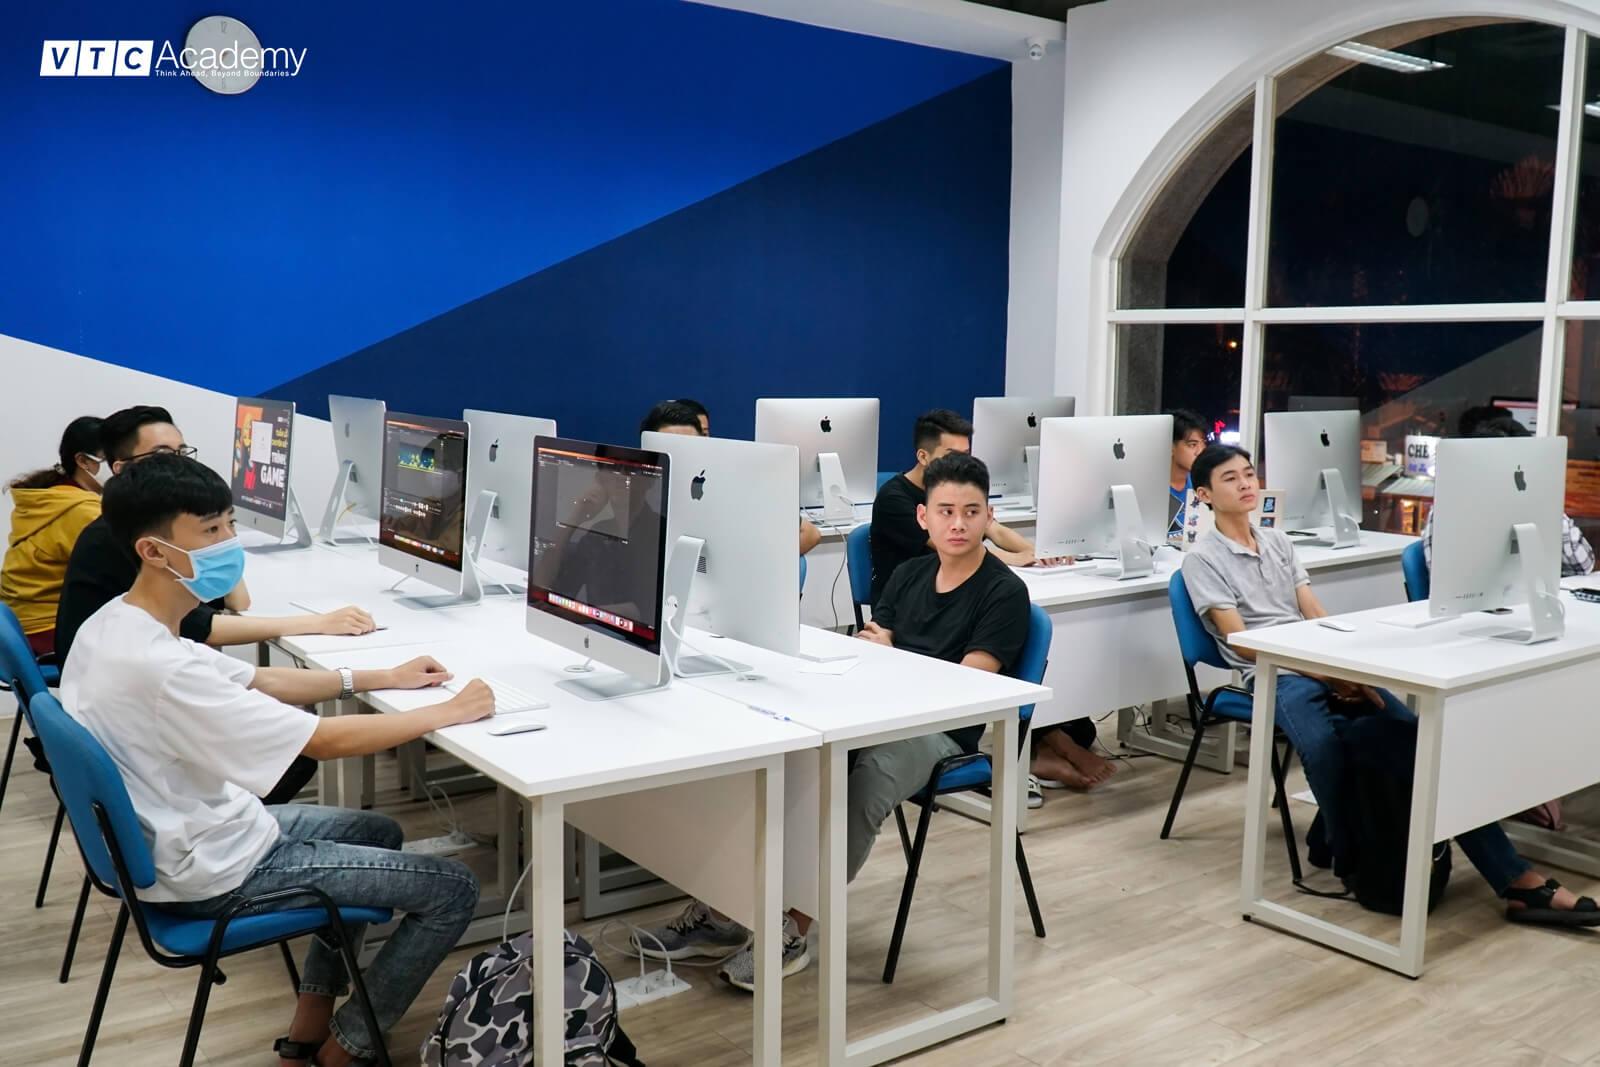 vtc-academy-hoc-thu-lap-trinh-game-5